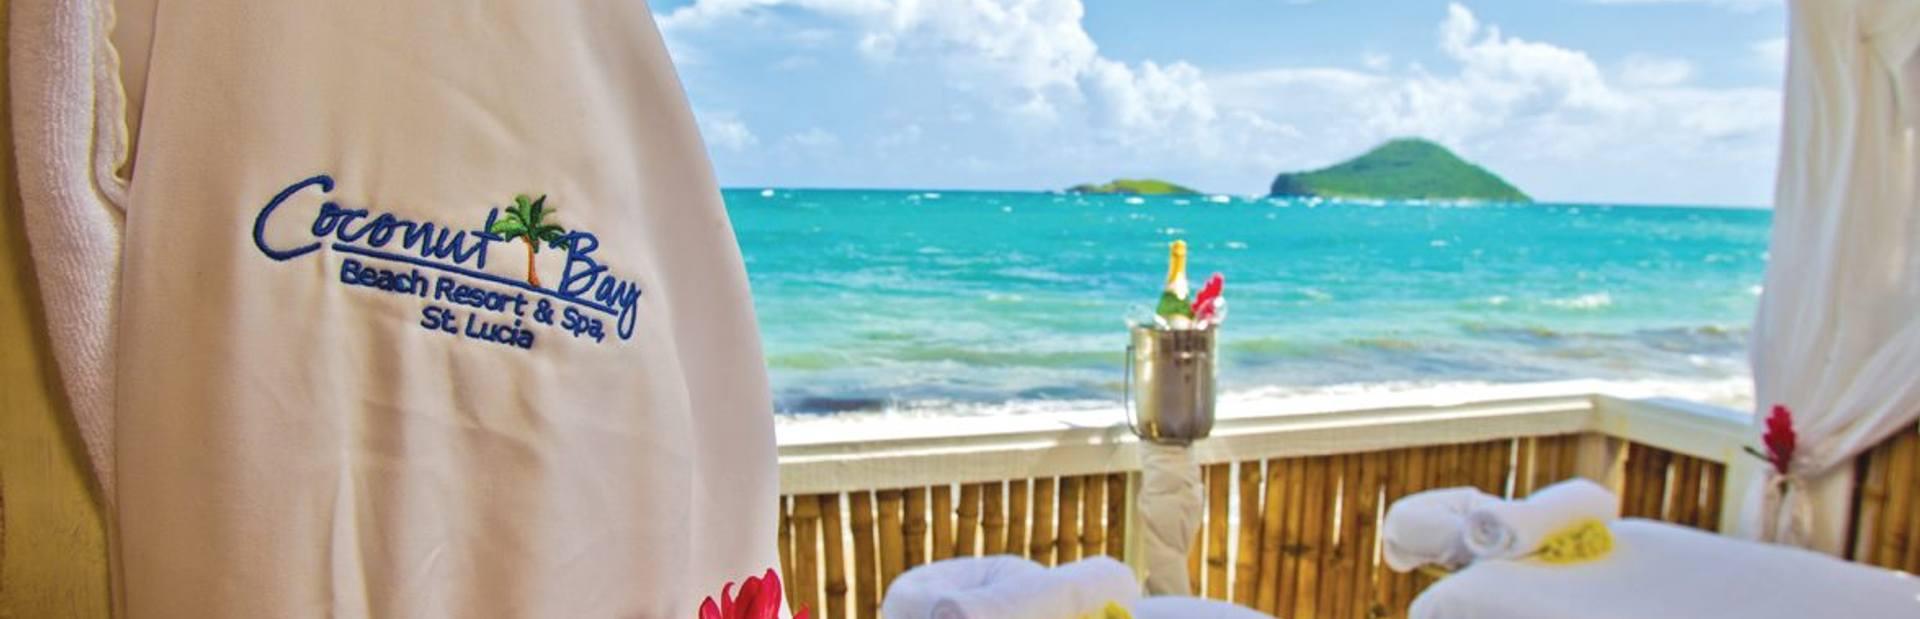 Coconut Bay Beach Resort & Spa Image 1